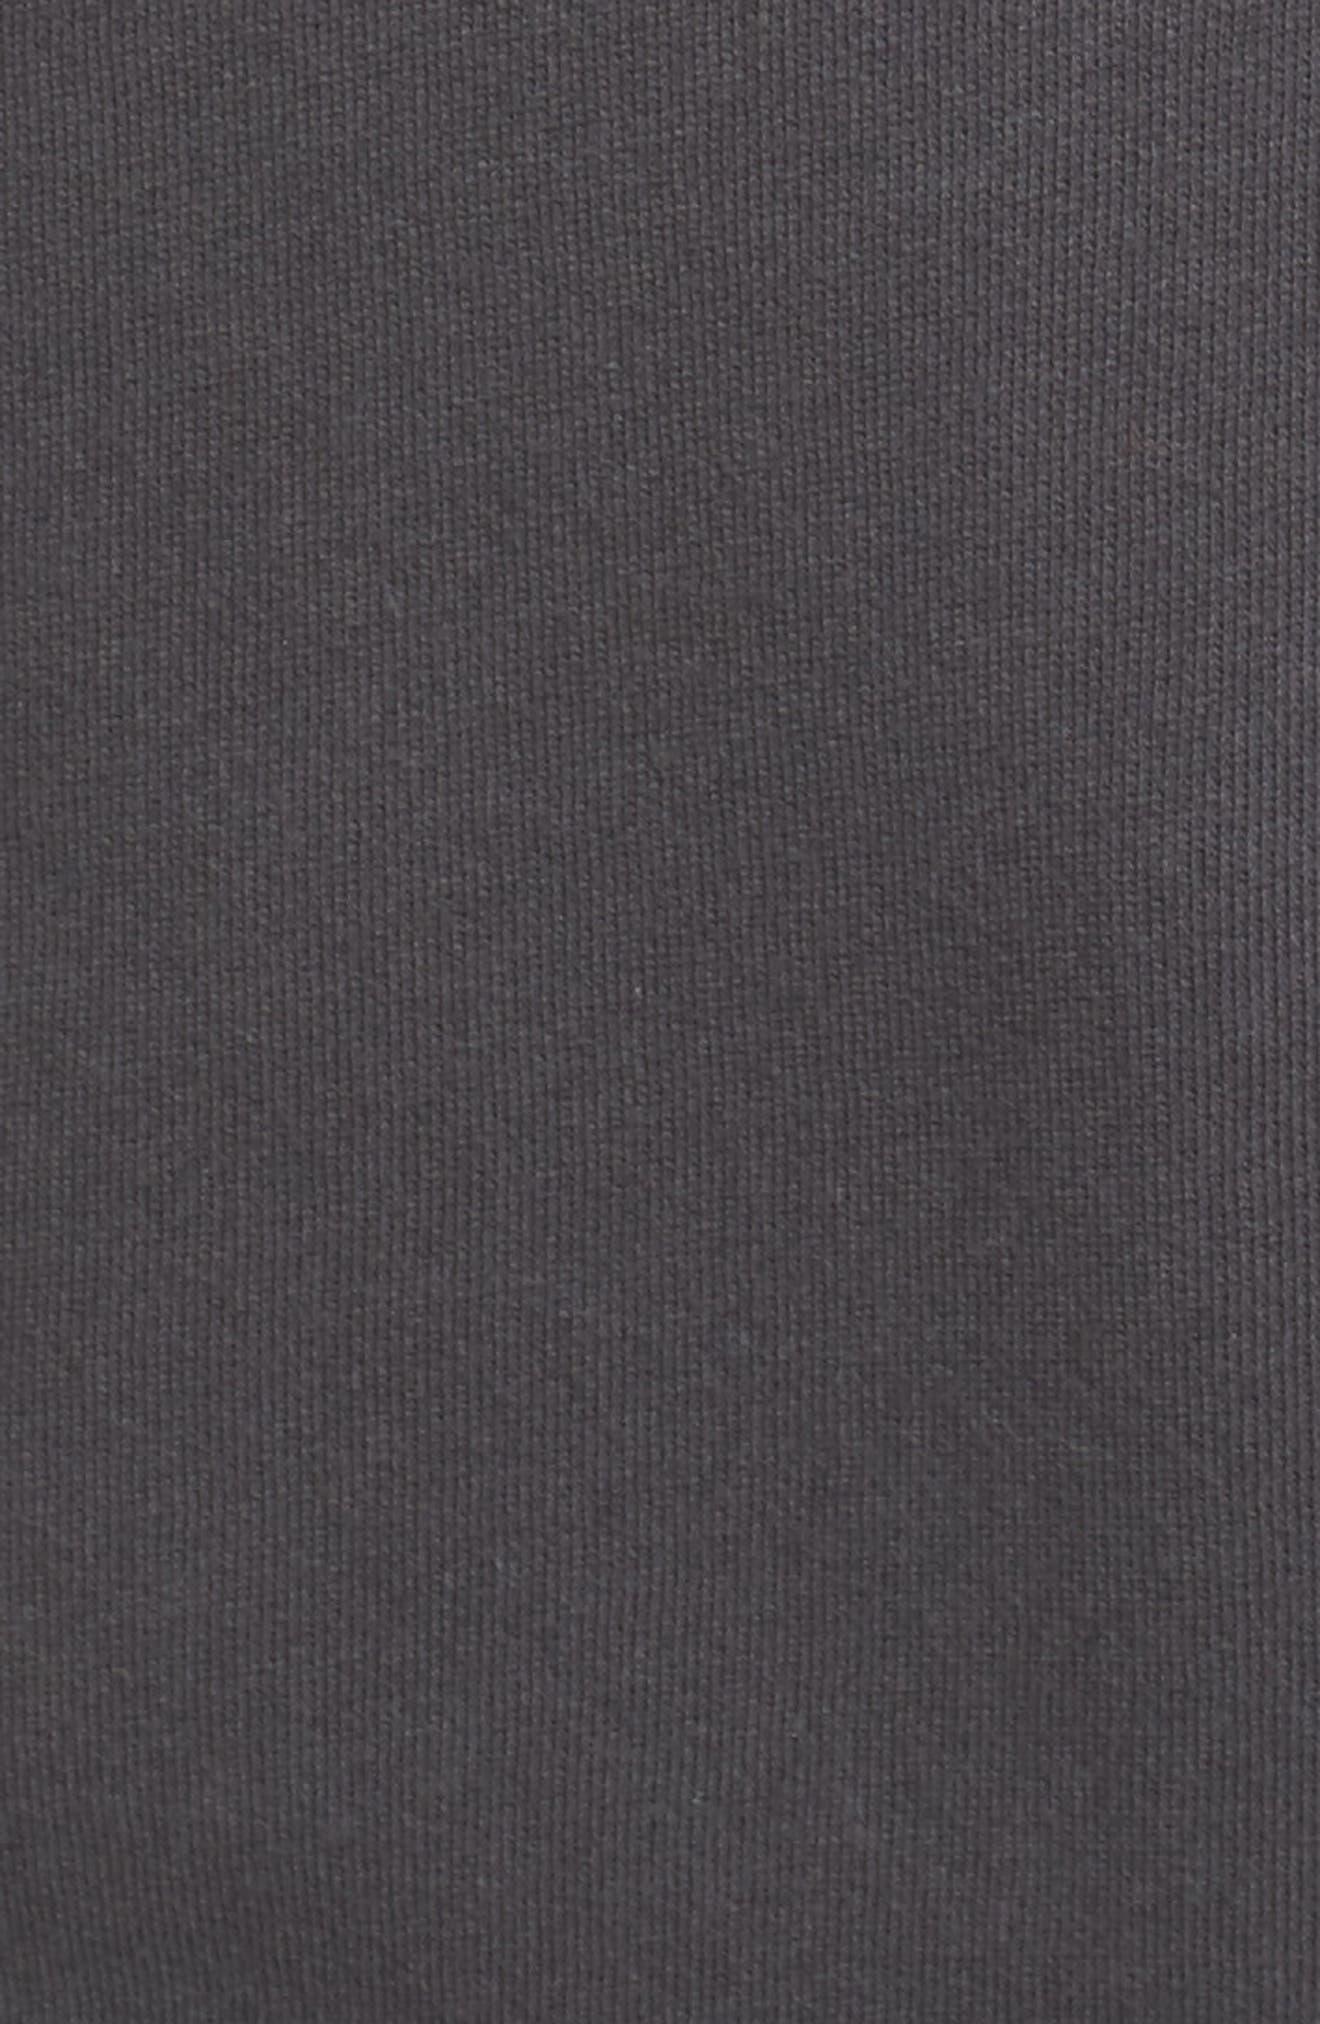 Feeling Bubbly Sweatshirt,                             Alternate thumbnail 5, color,                             001